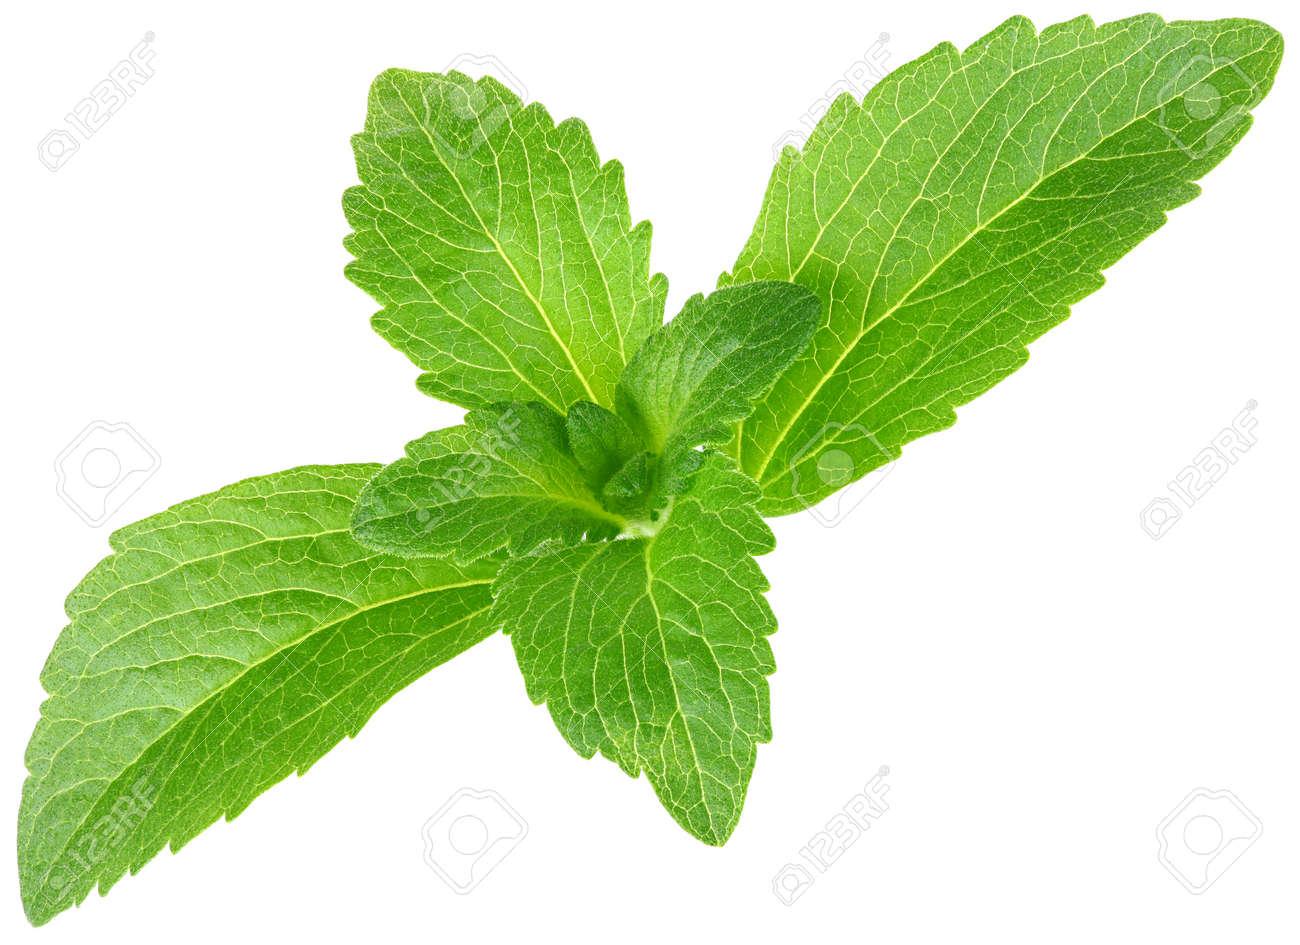 Stevia rebaudiana, sweet leaf sugar substitute isolated on white background Standard-Bild - 13957649